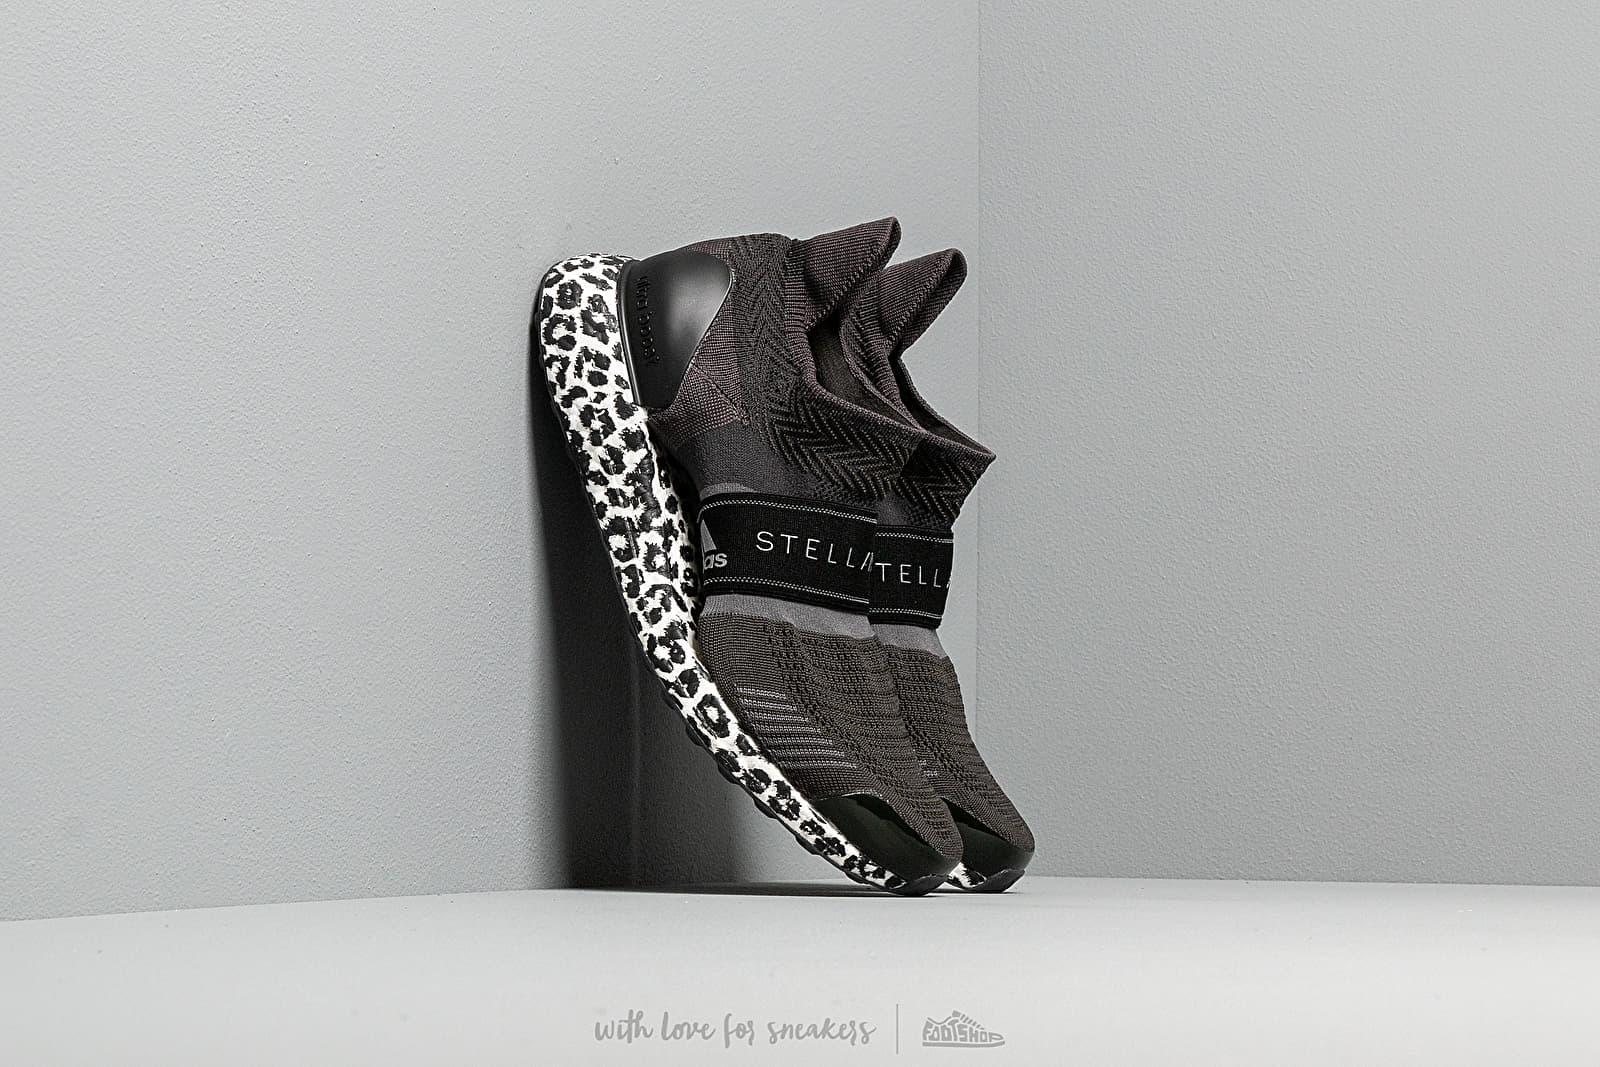 adidas x Stella McCartney UltraBOOST X 3.D.